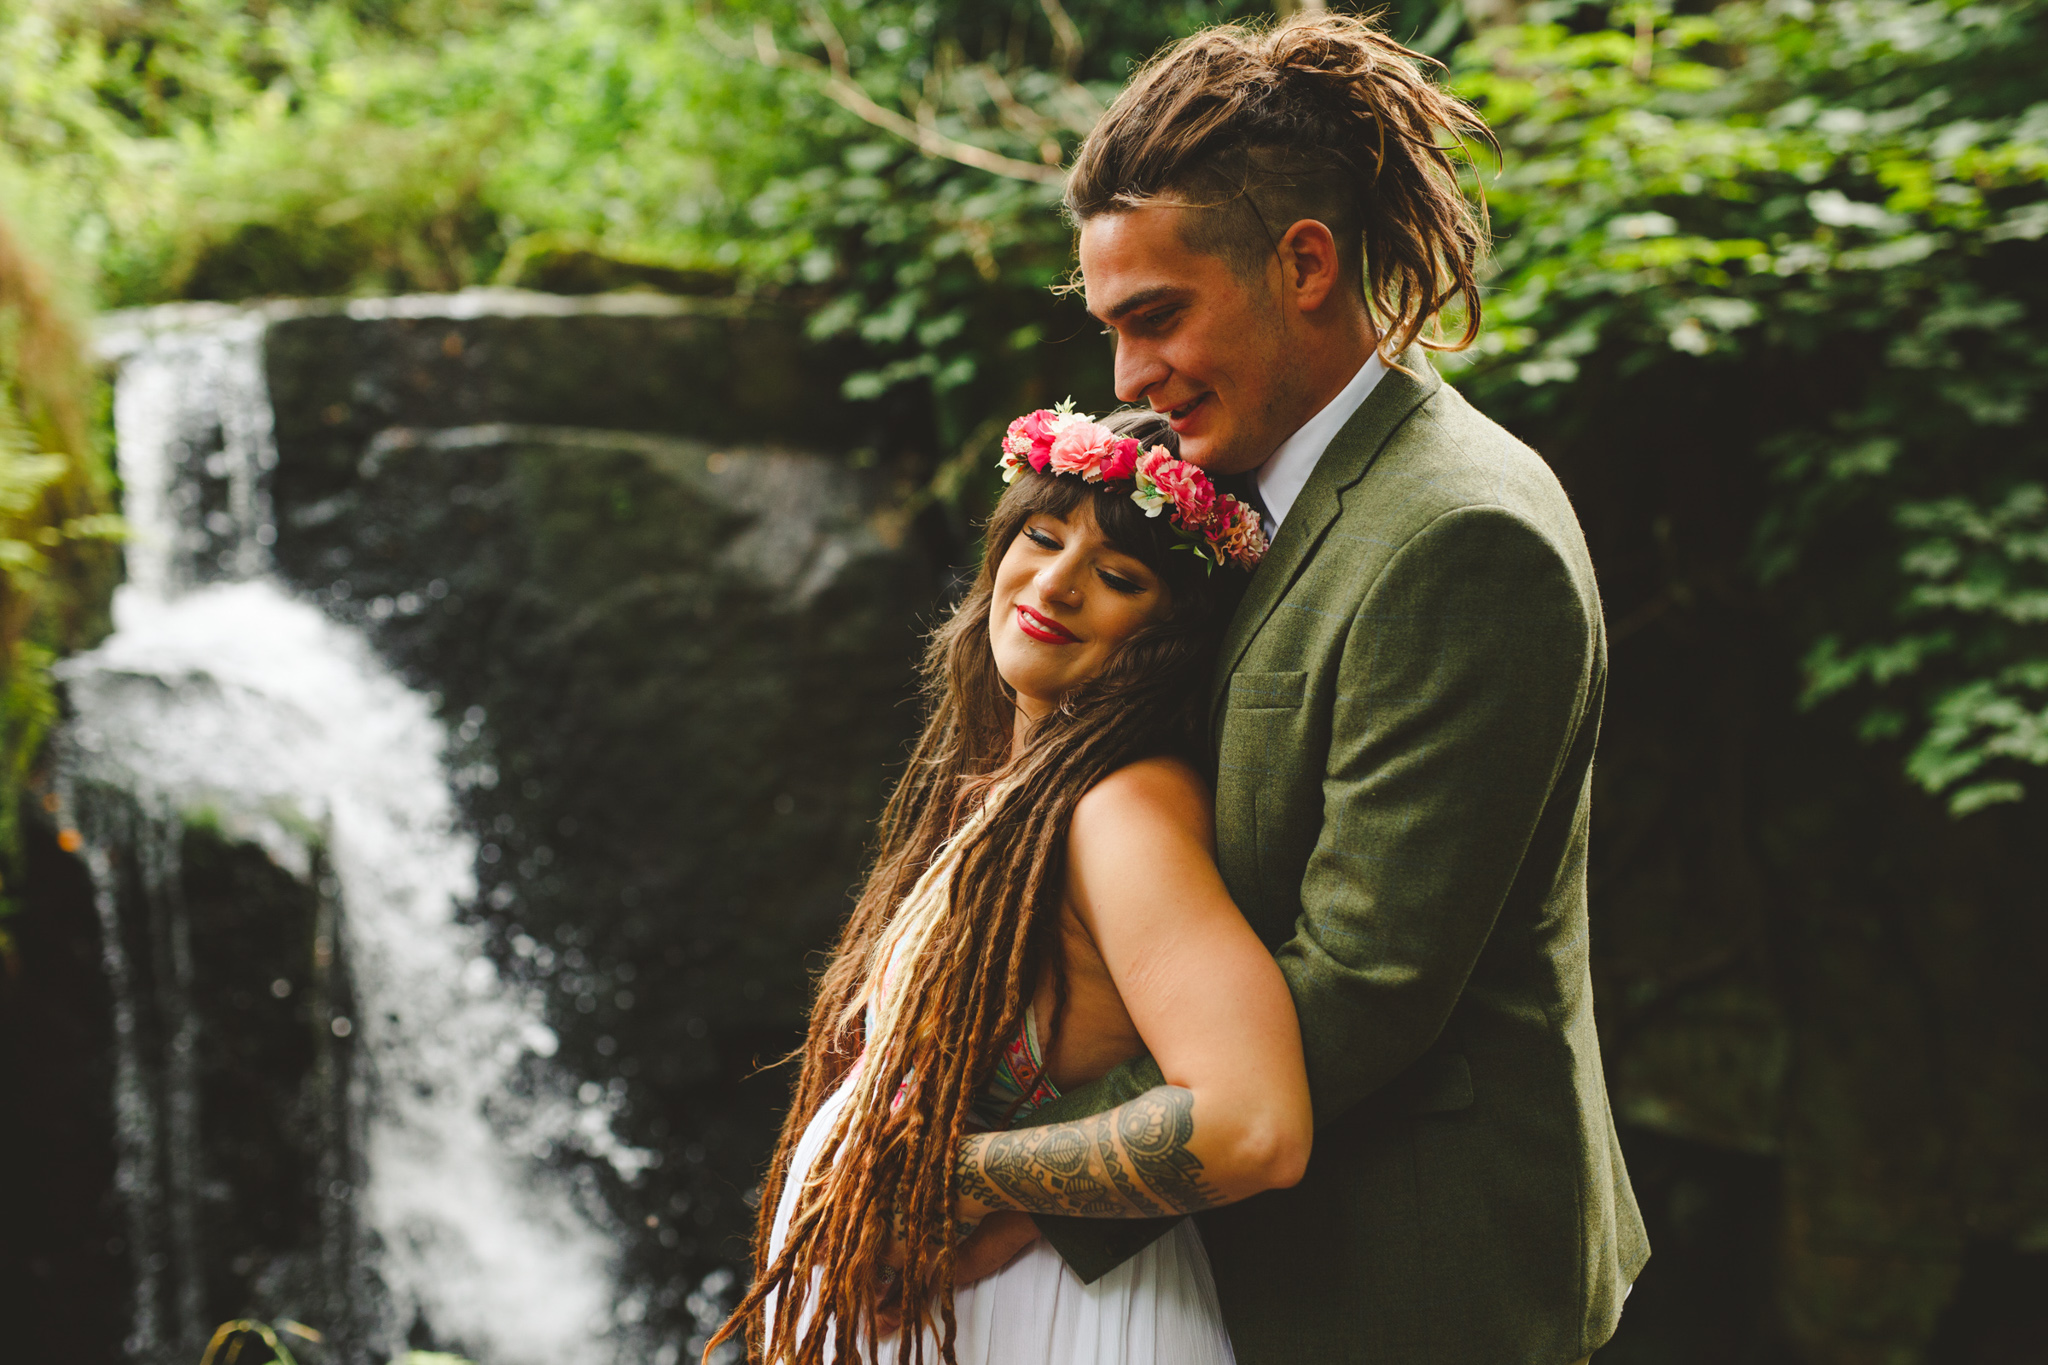 quirky-wedding-photography-camera-hannah-63.jpg